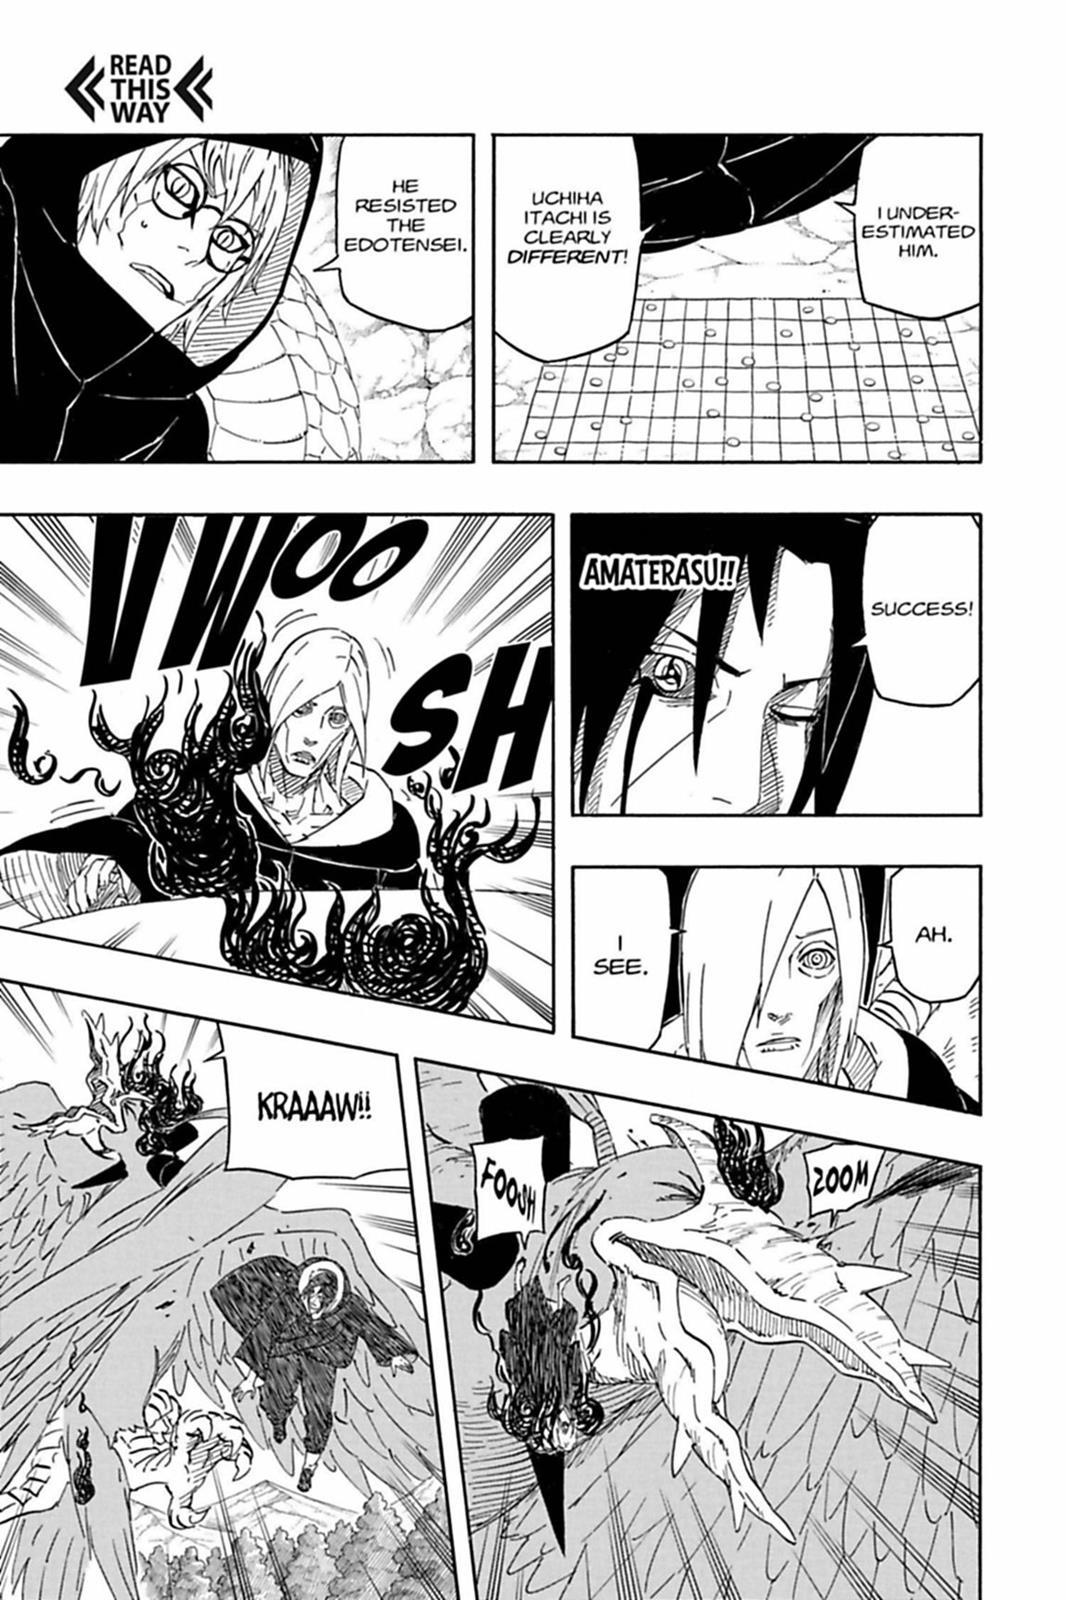 Segundo Kabuto, Itachi está acima de Nagato, Bee e Naruto KM. 0550-007